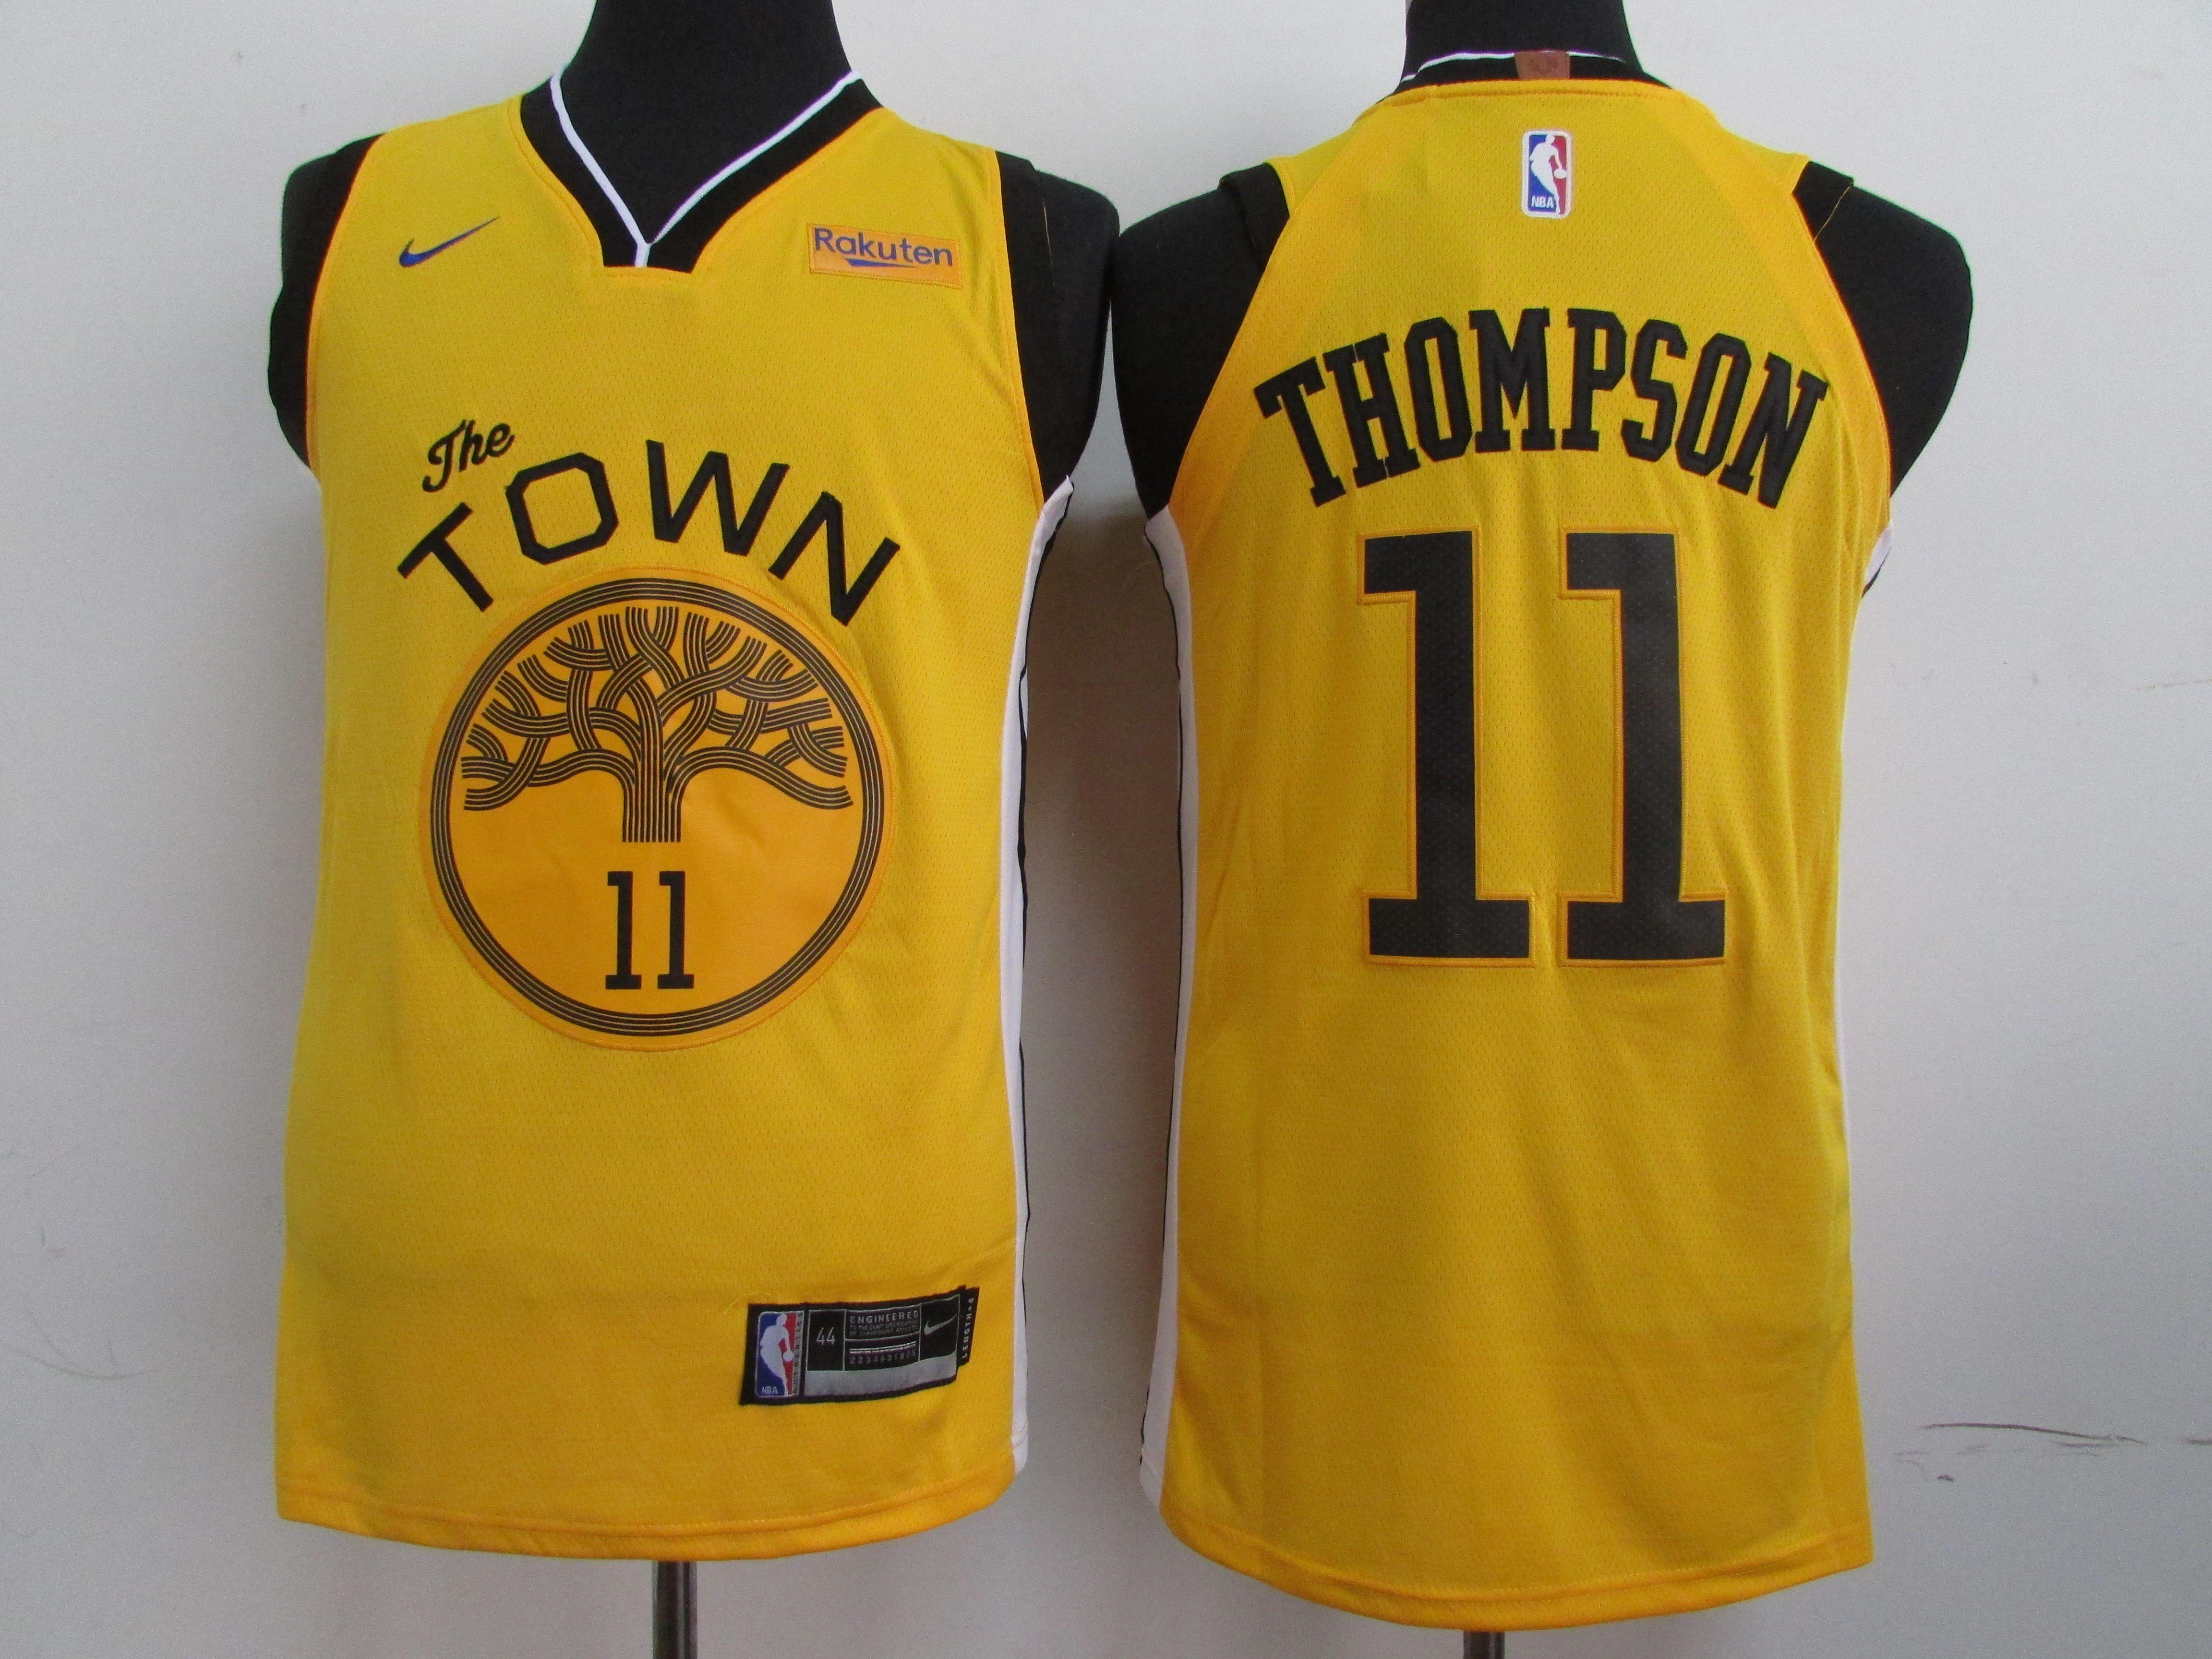 a32dda4a Men Golden State Warriors 11 Thompson yellow black Game Nike NBA Jerseys